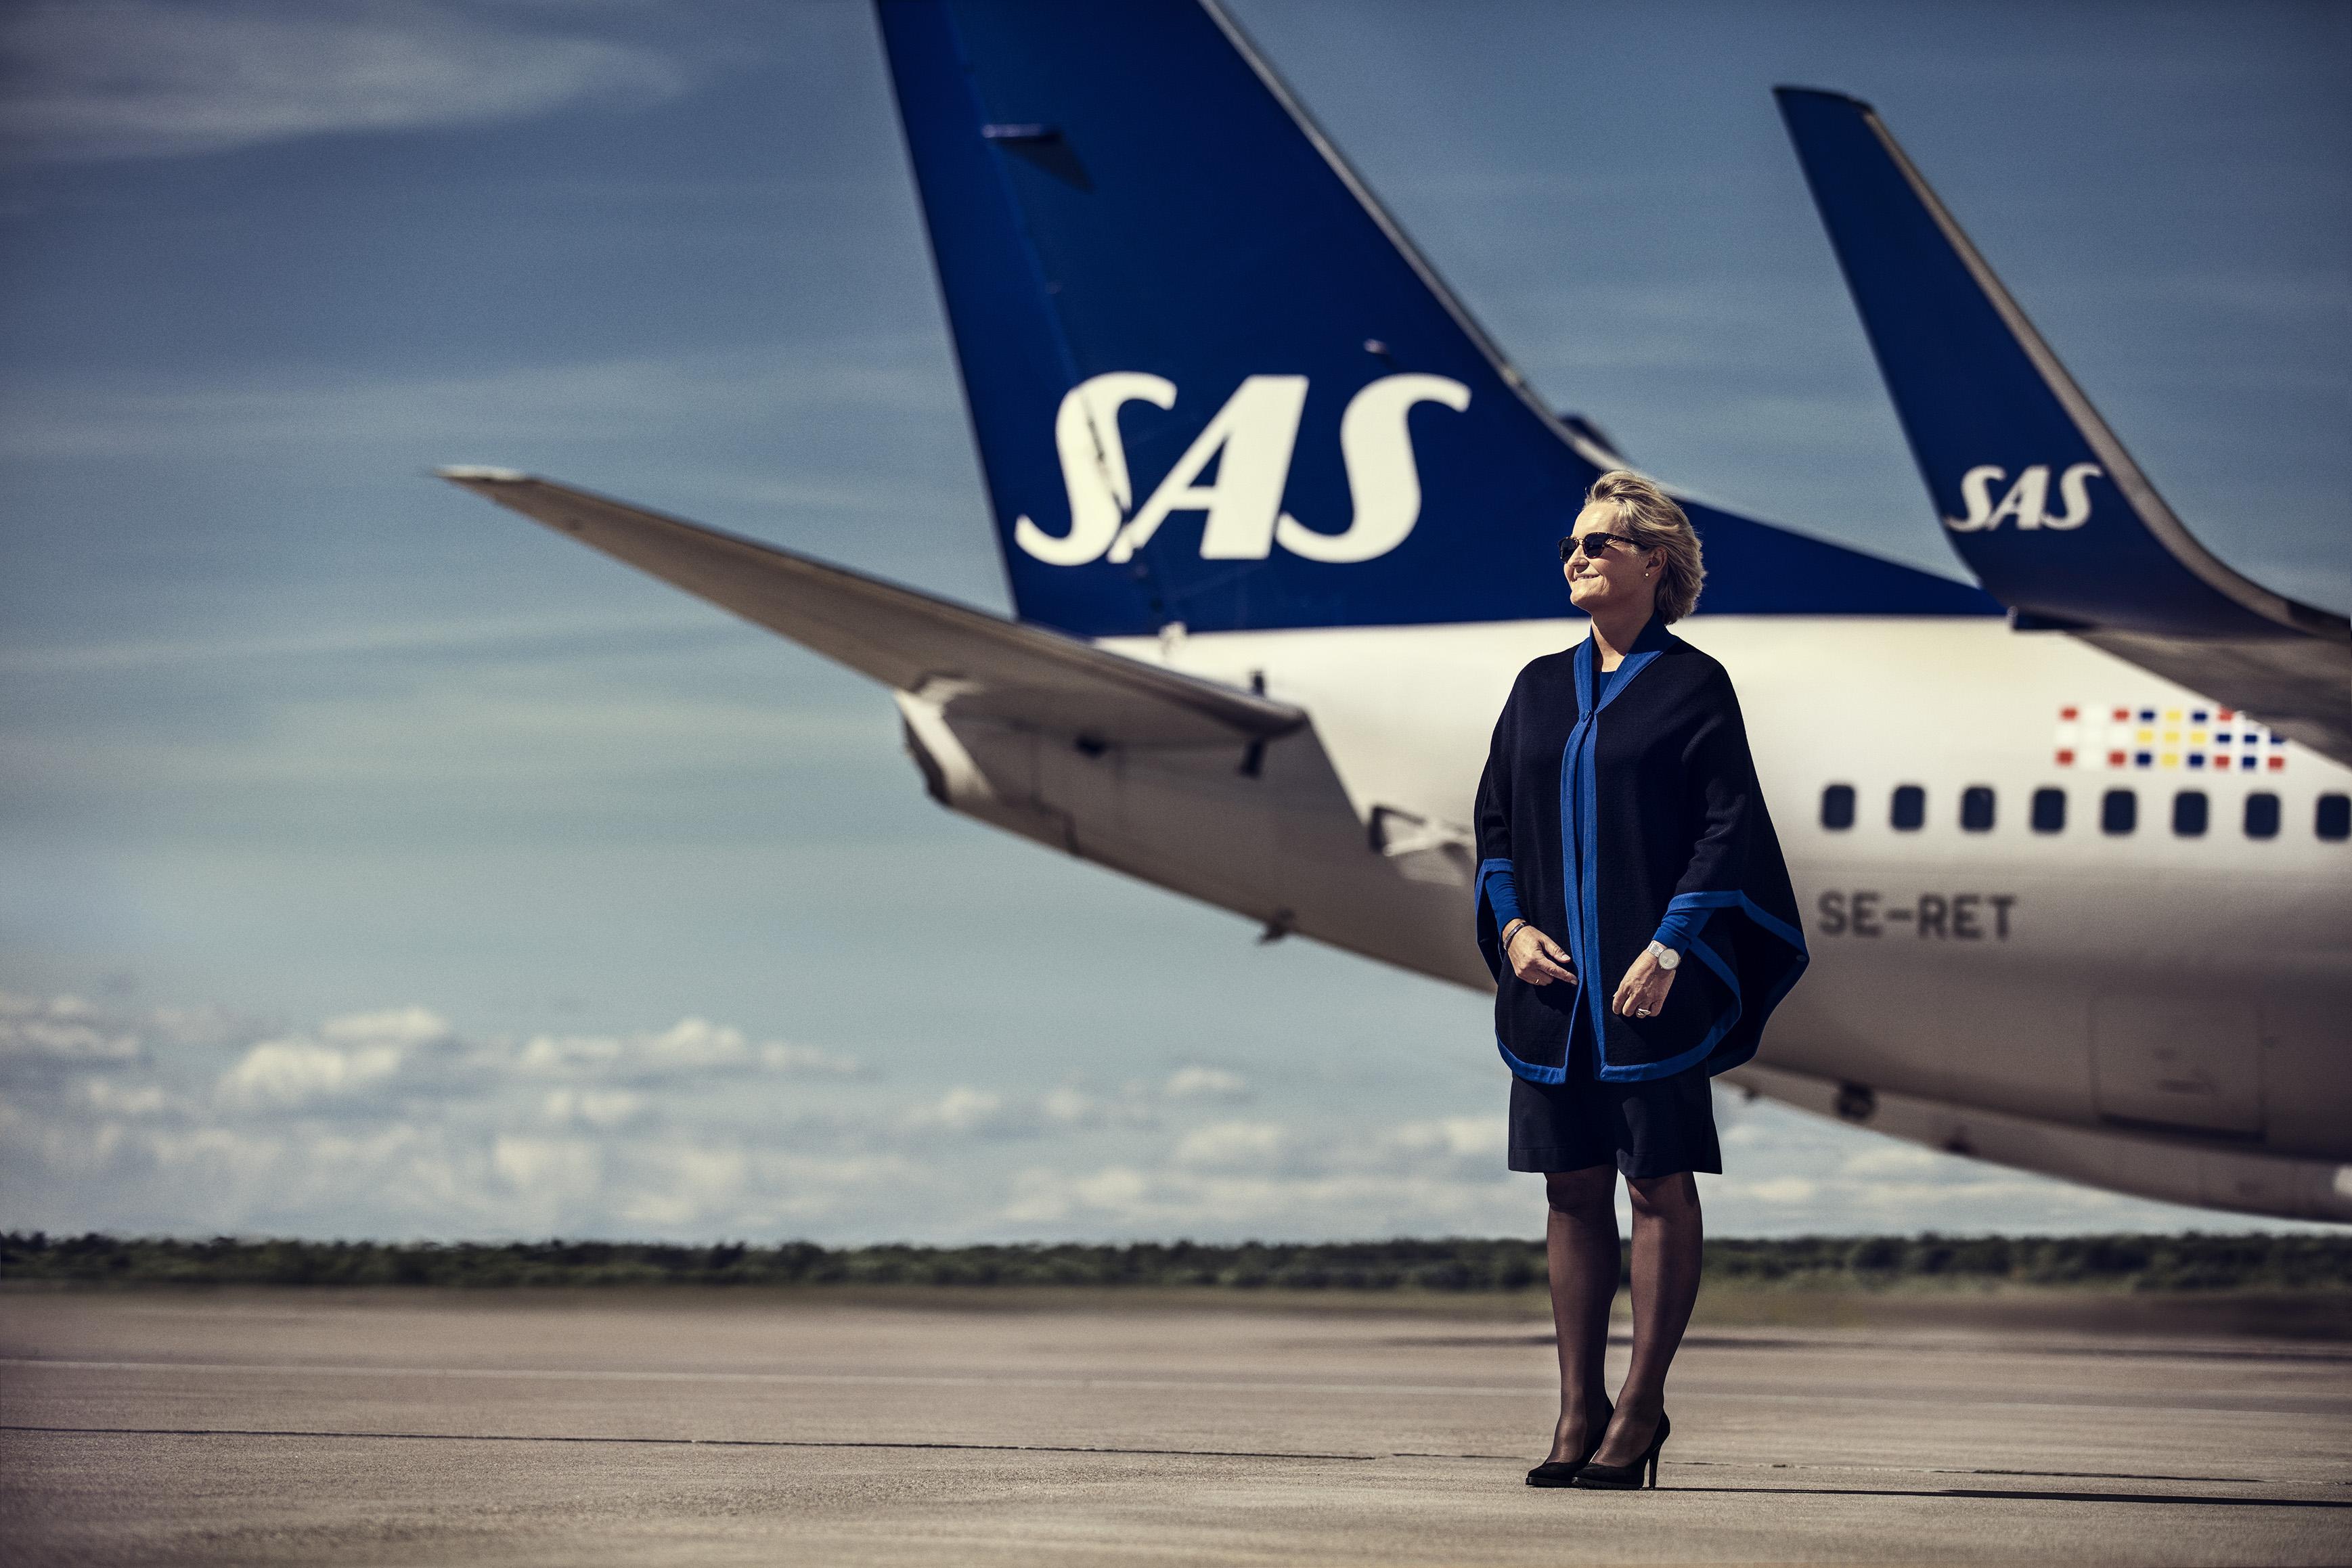 sas youth flights